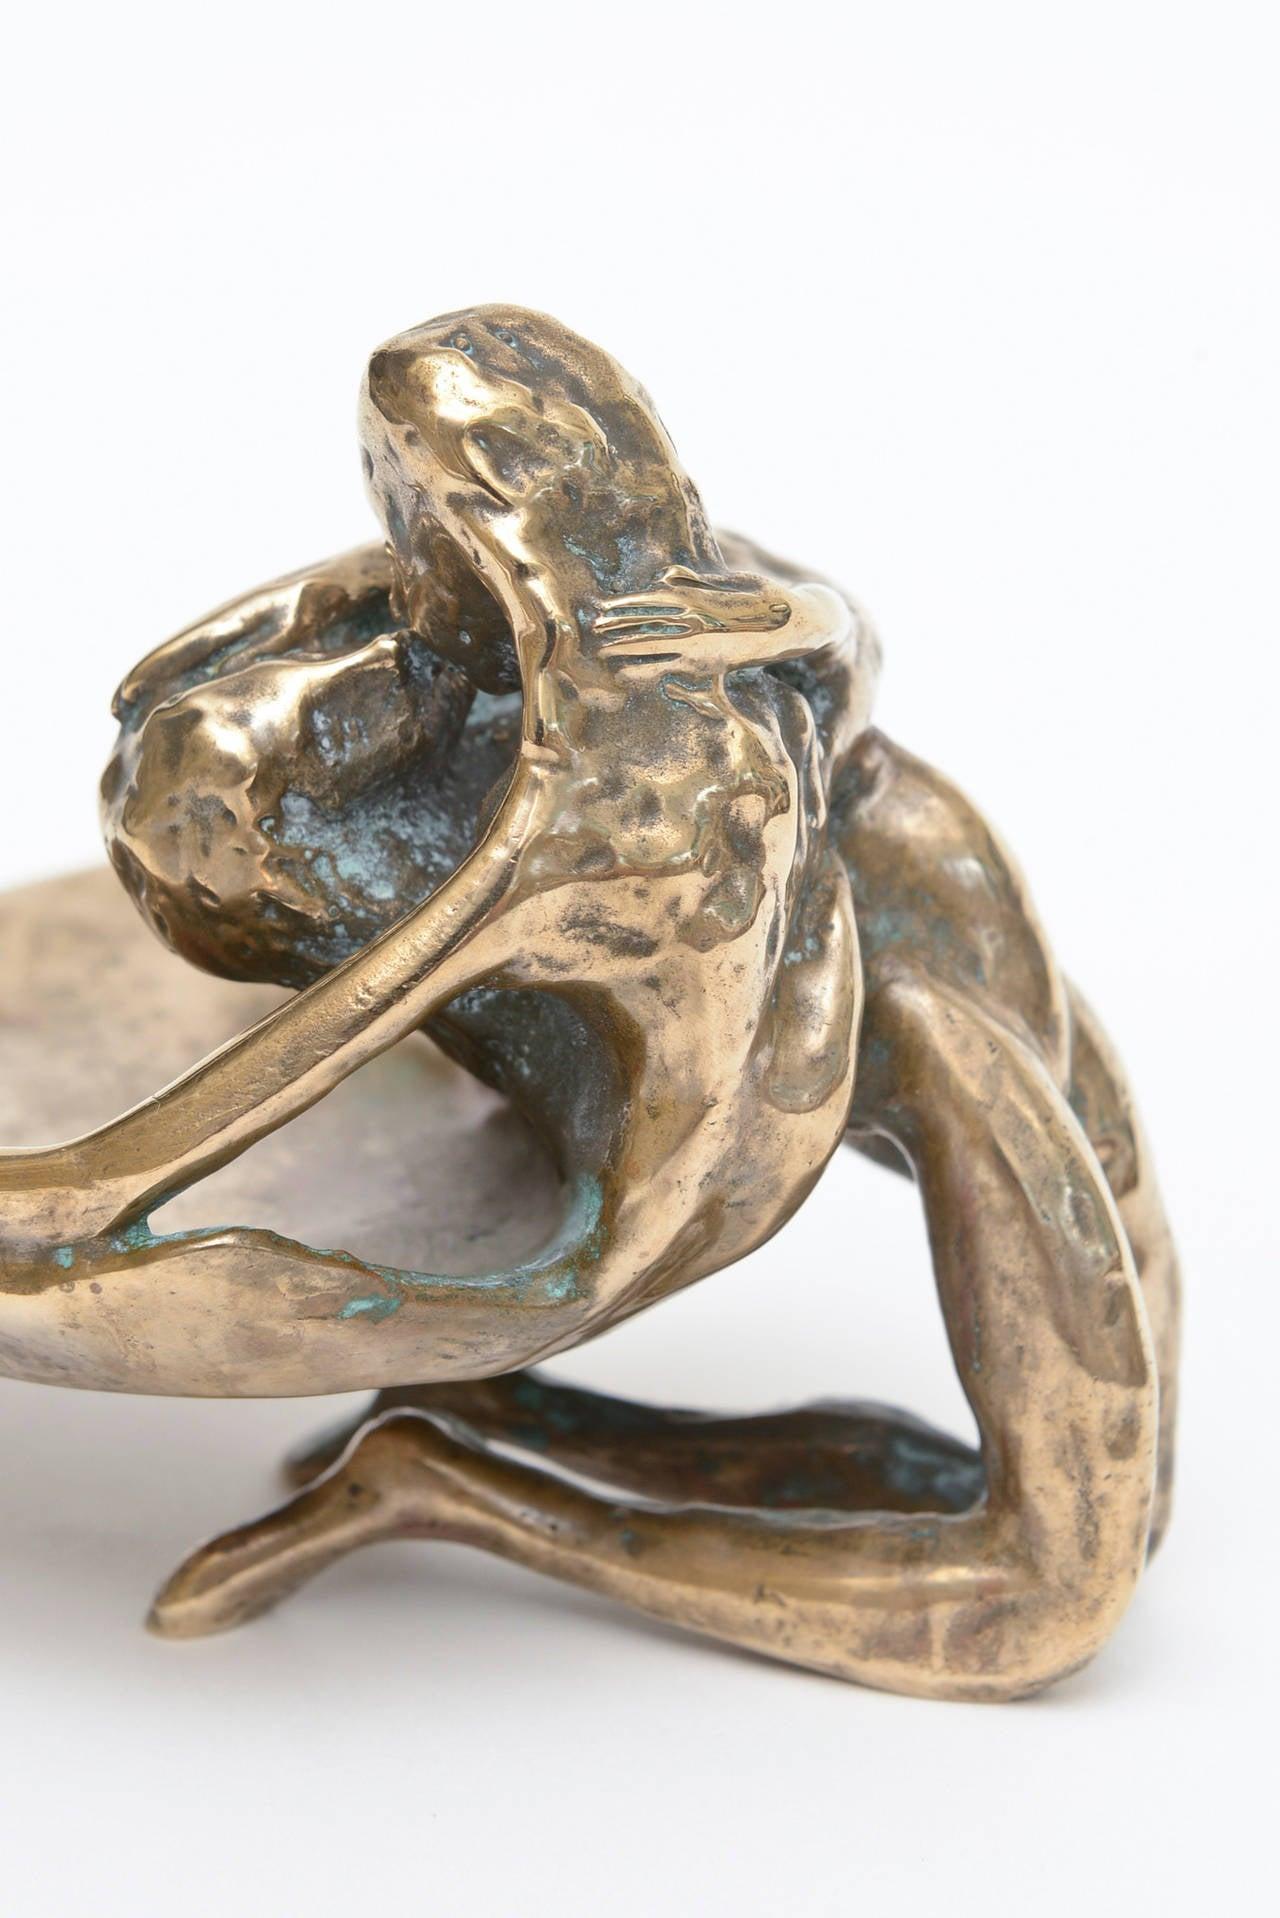 Modern Bronze Victor Zaikine Sculpture Titled Lovers Embrace For Sale